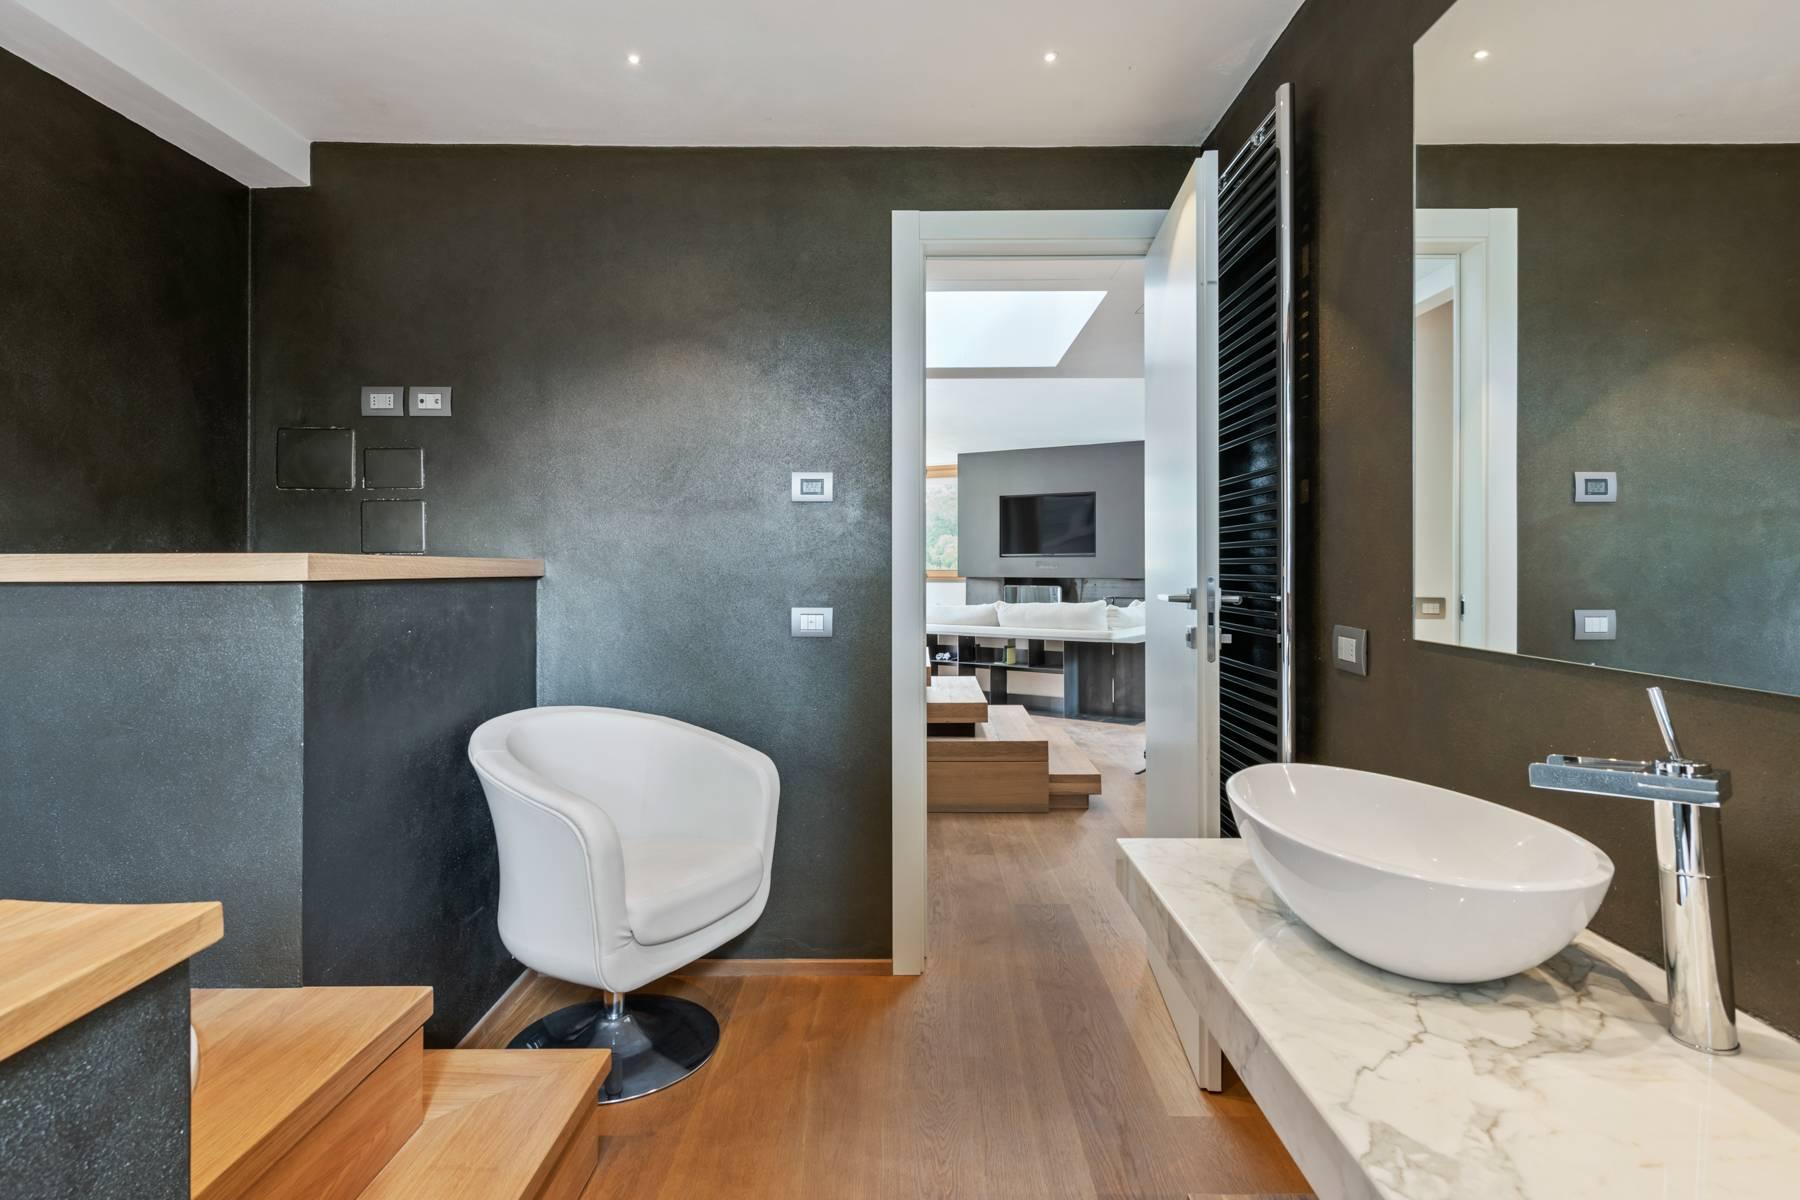 Appartamento in Vendita a Pontassieve: 5 locali, 300 mq - Foto 10